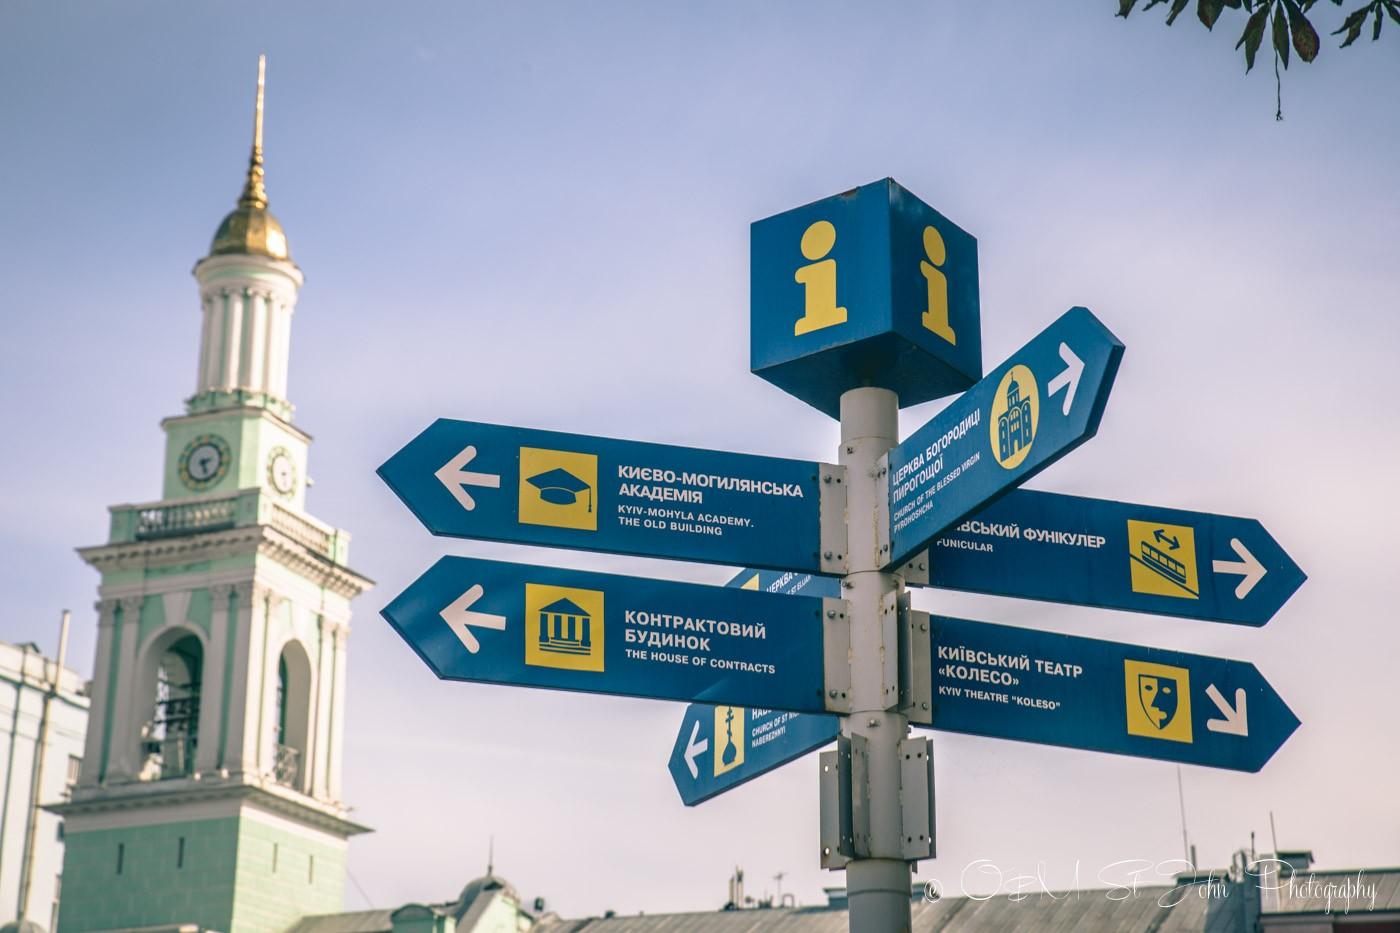 Information signs in the city centre in Kiev, Ukraine